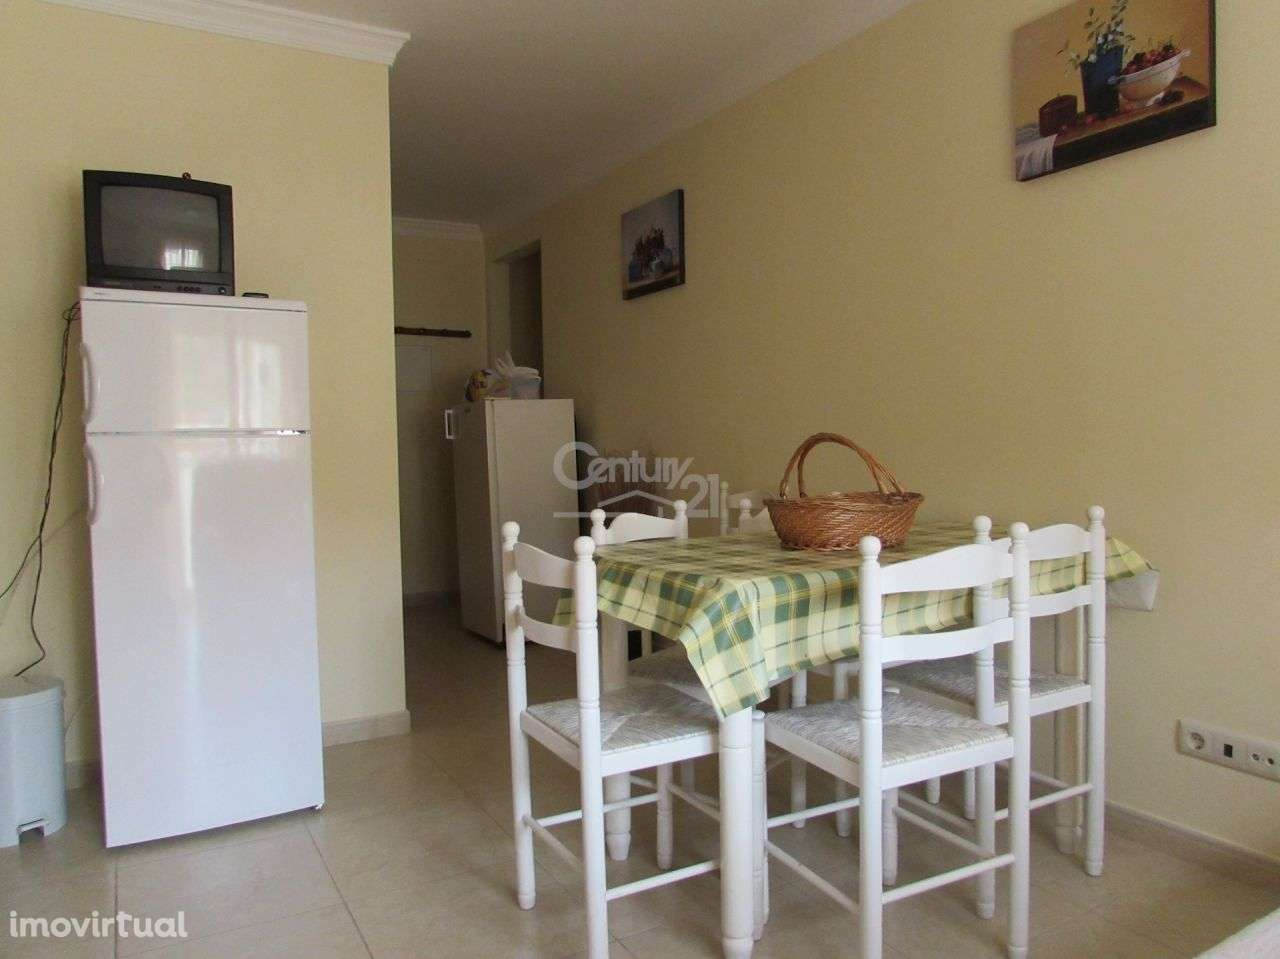 Apartamento para comprar, Monte Gordo, Faro - Foto 3